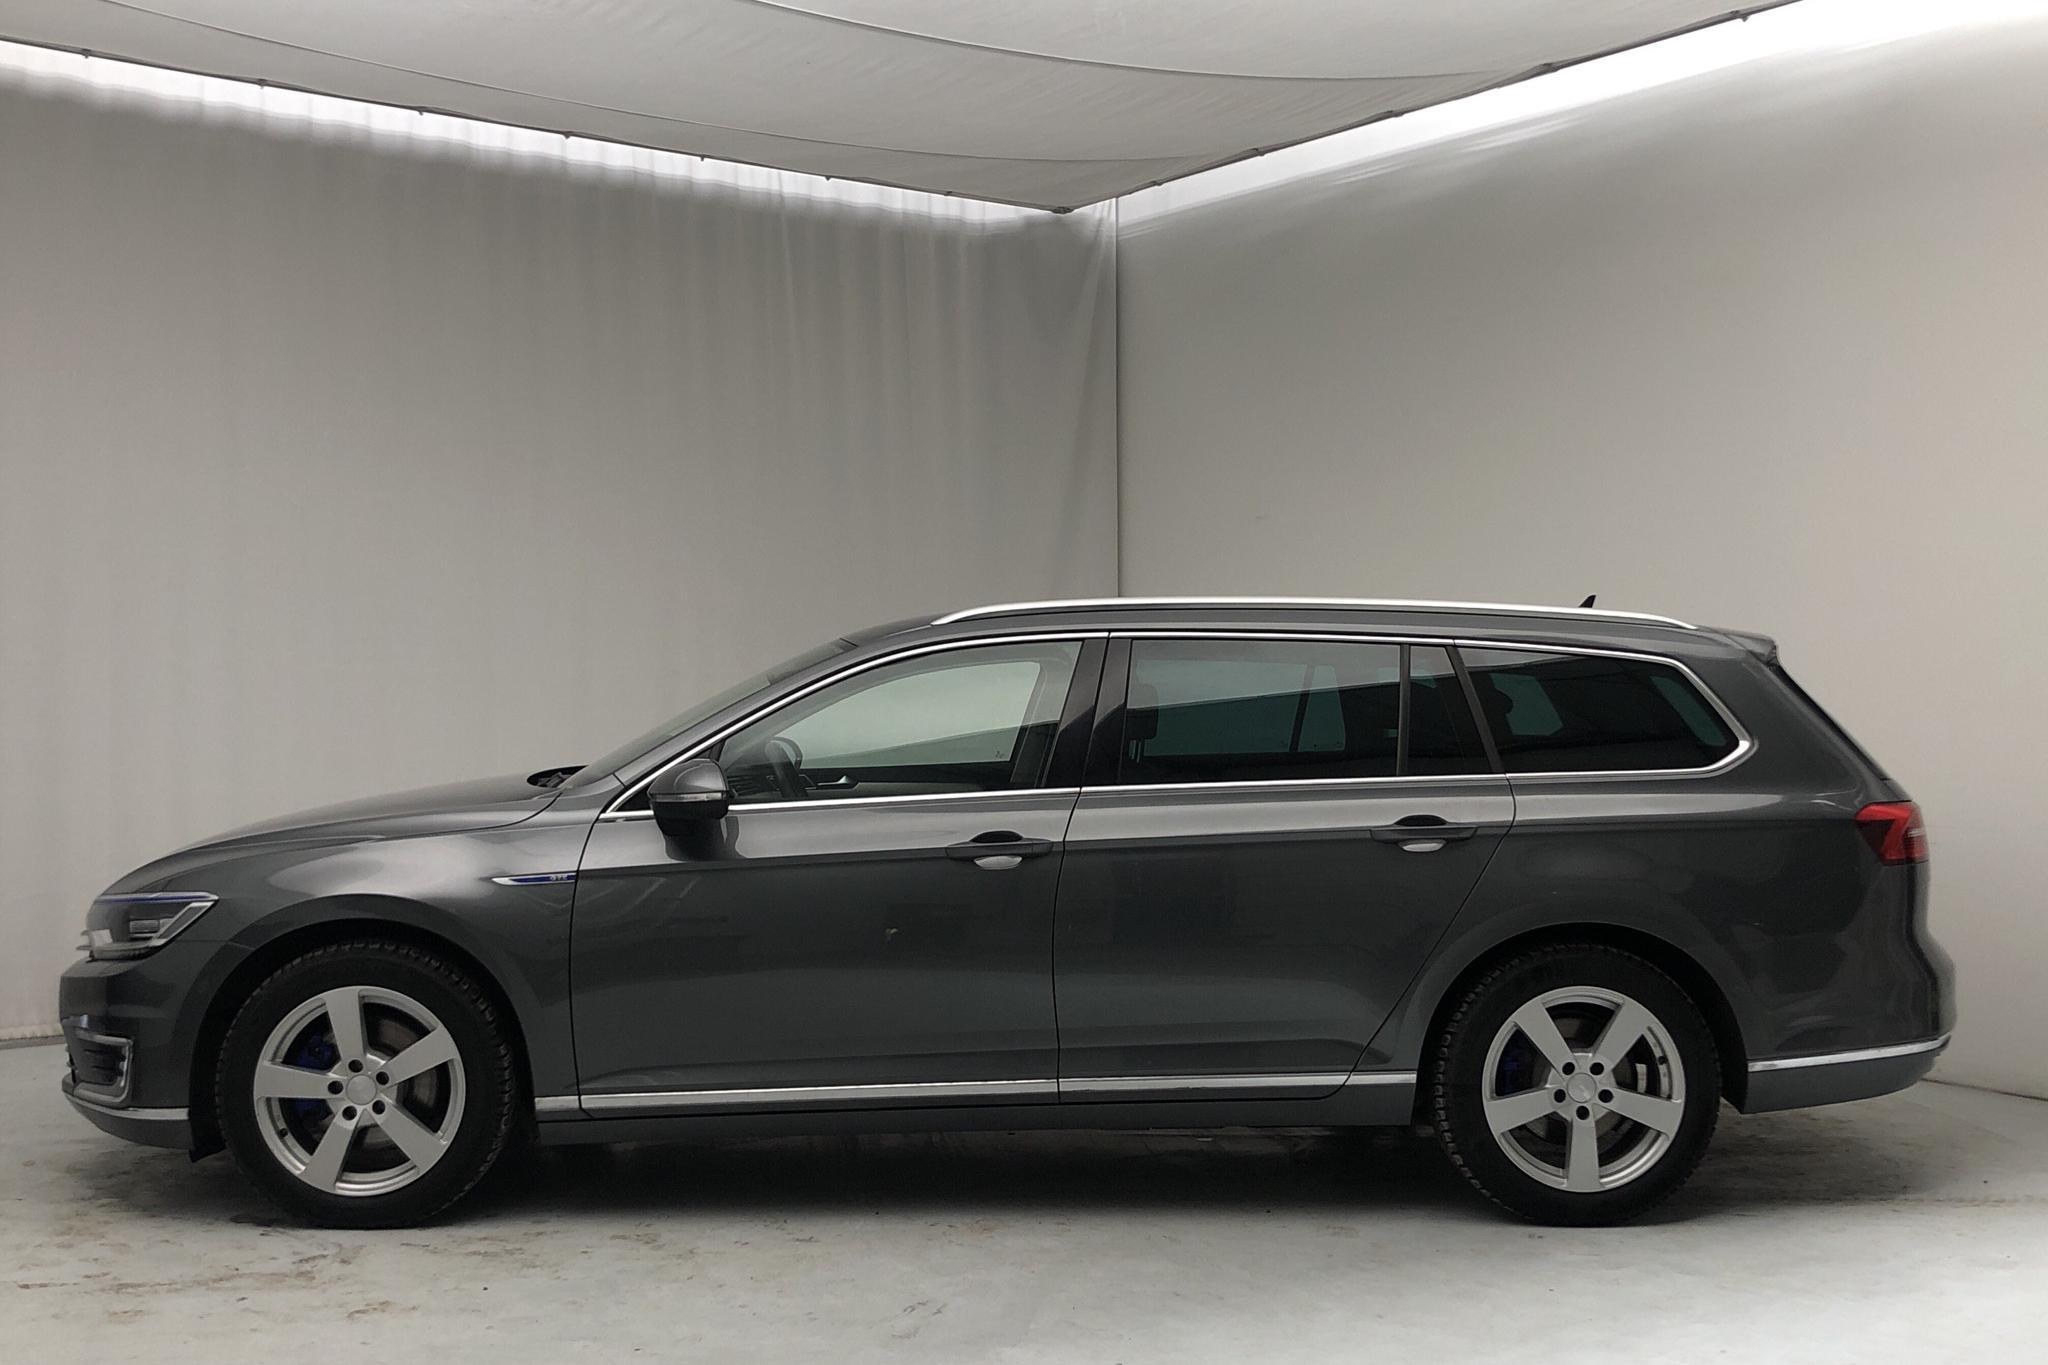 VW Passat 1.4 Plug-in-Hybrid Sportscombi (218hk) - 63 540 km - Automatic - Dark Grey - 2016